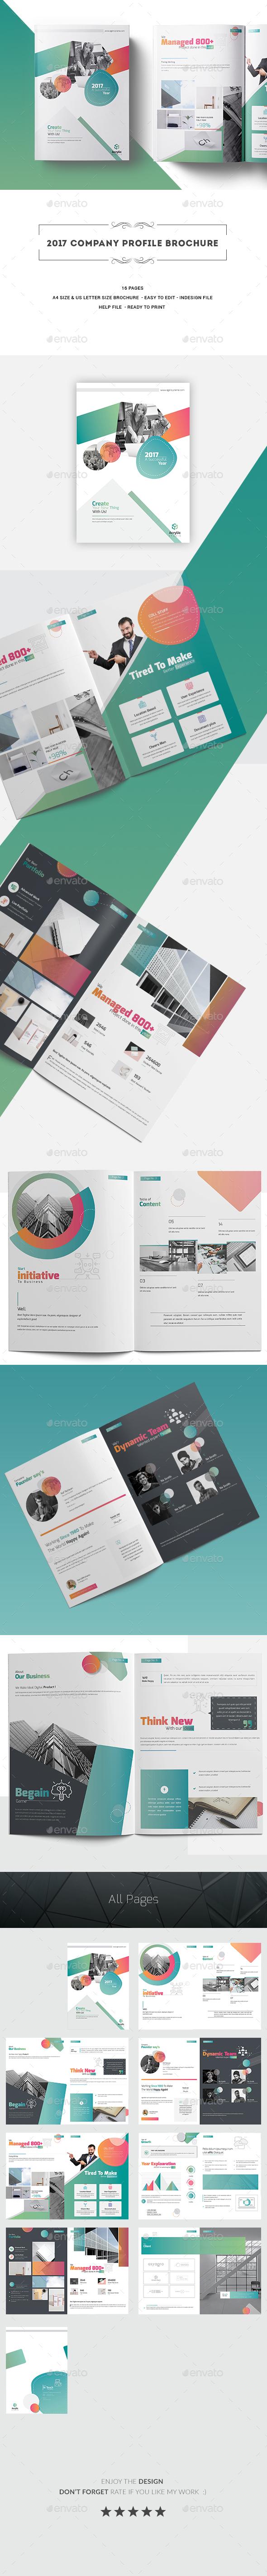 2017 Company Profile Brochure - Corporate Brochures